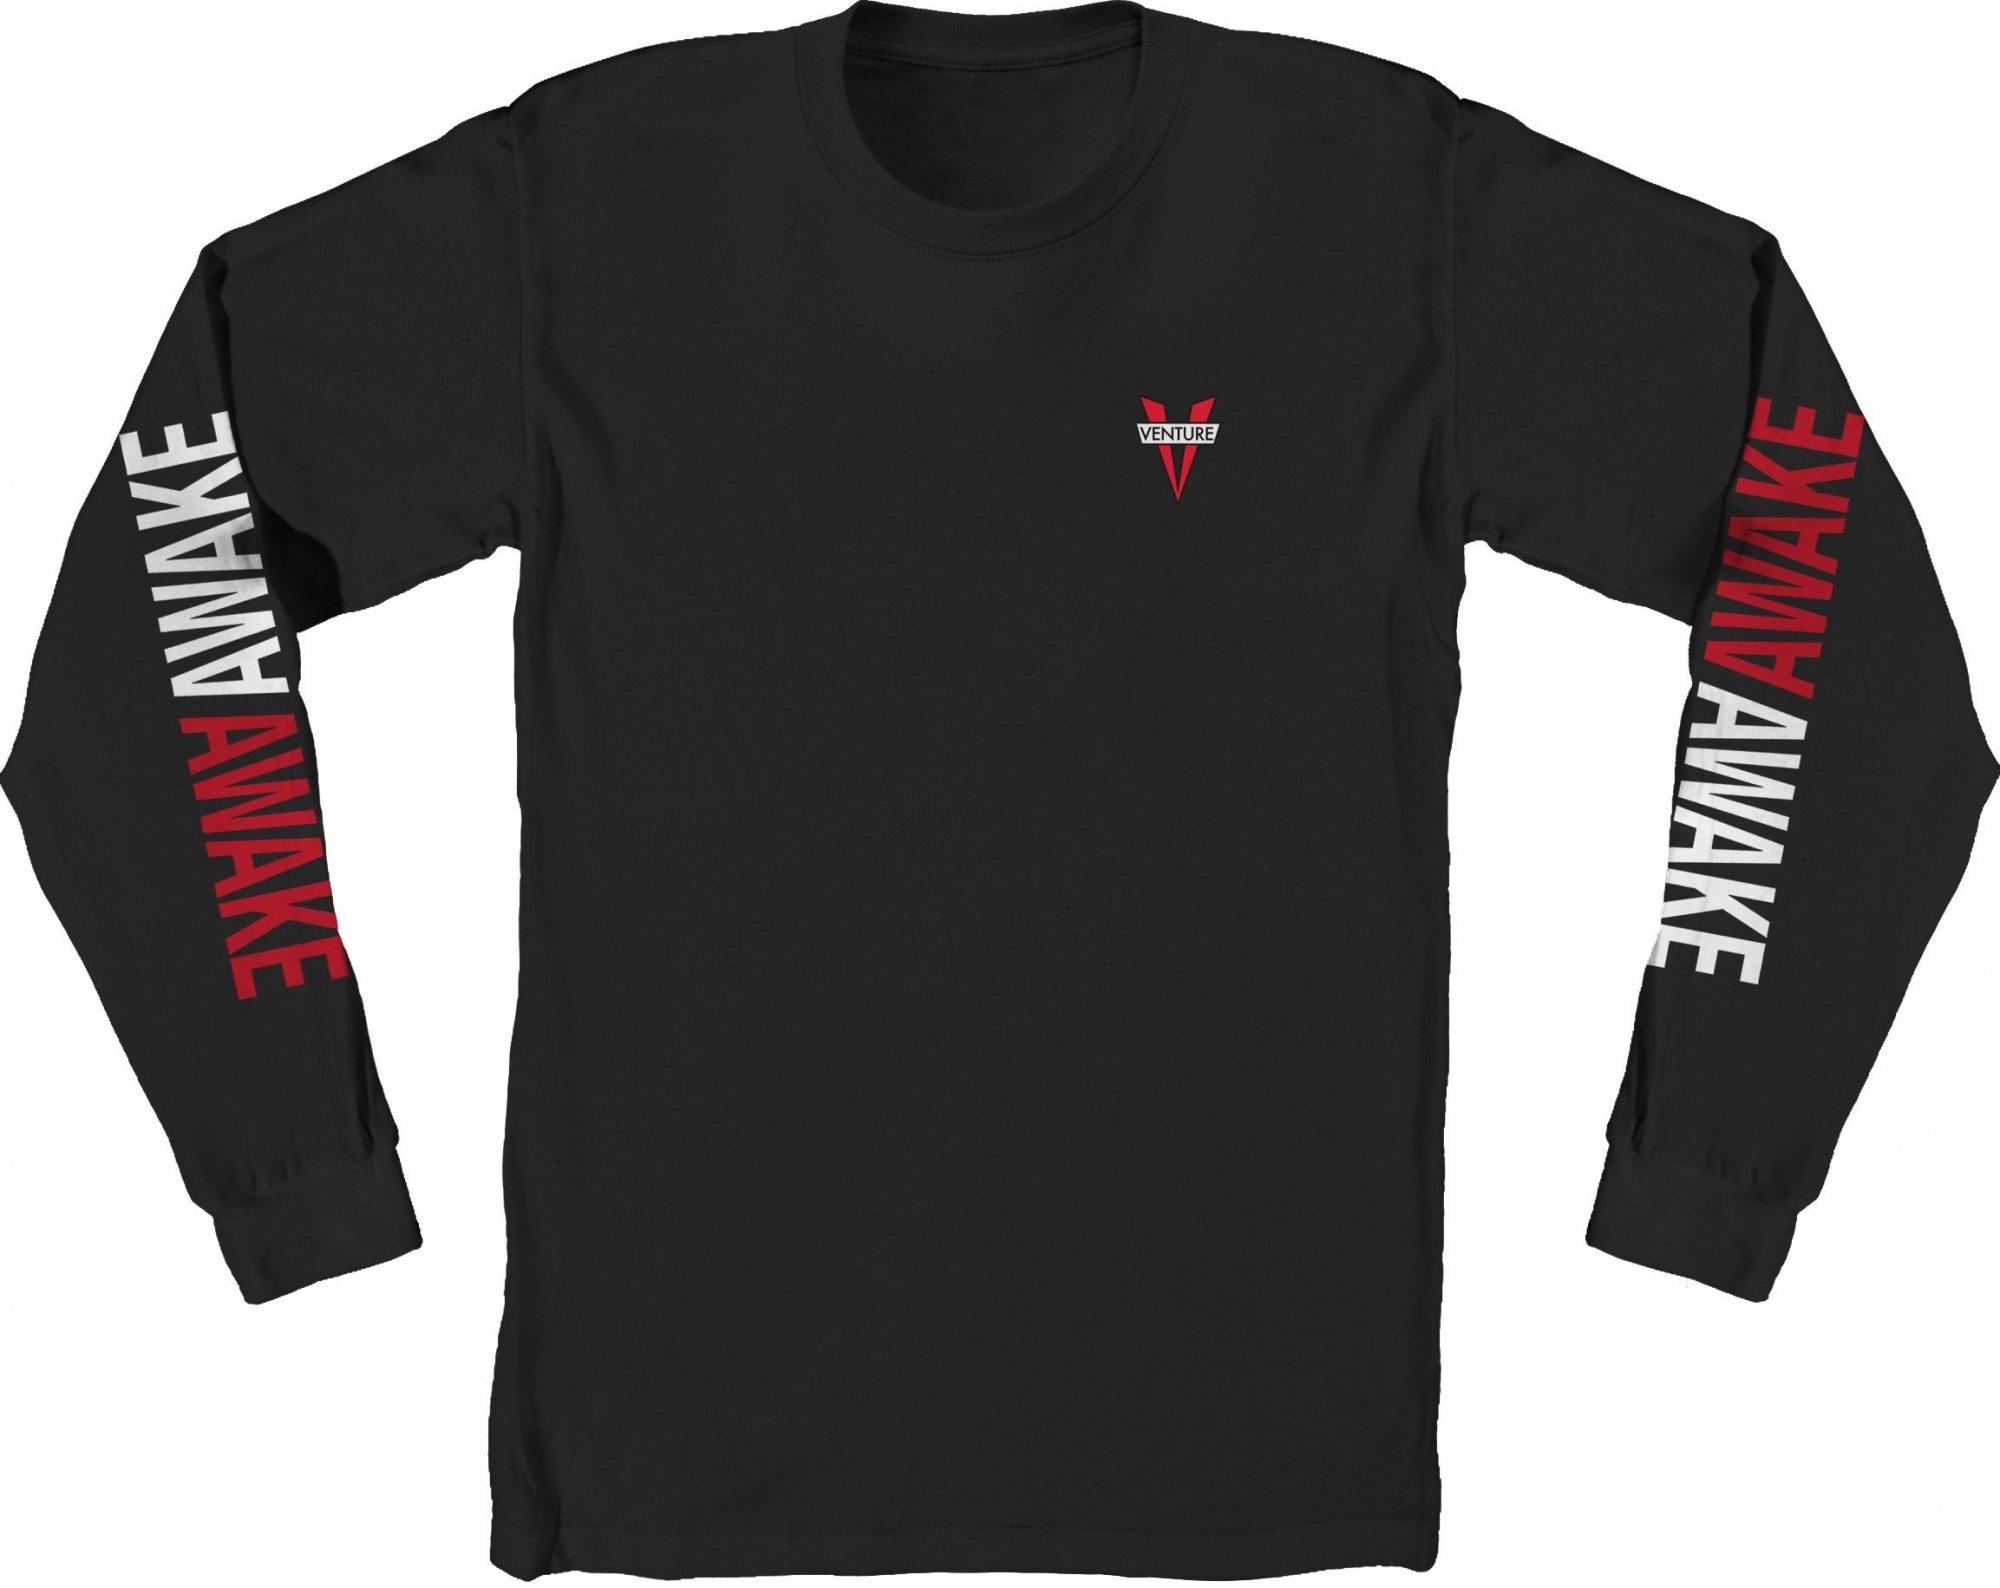 Venture Awaken Longsleeve Tee Black/White/Red